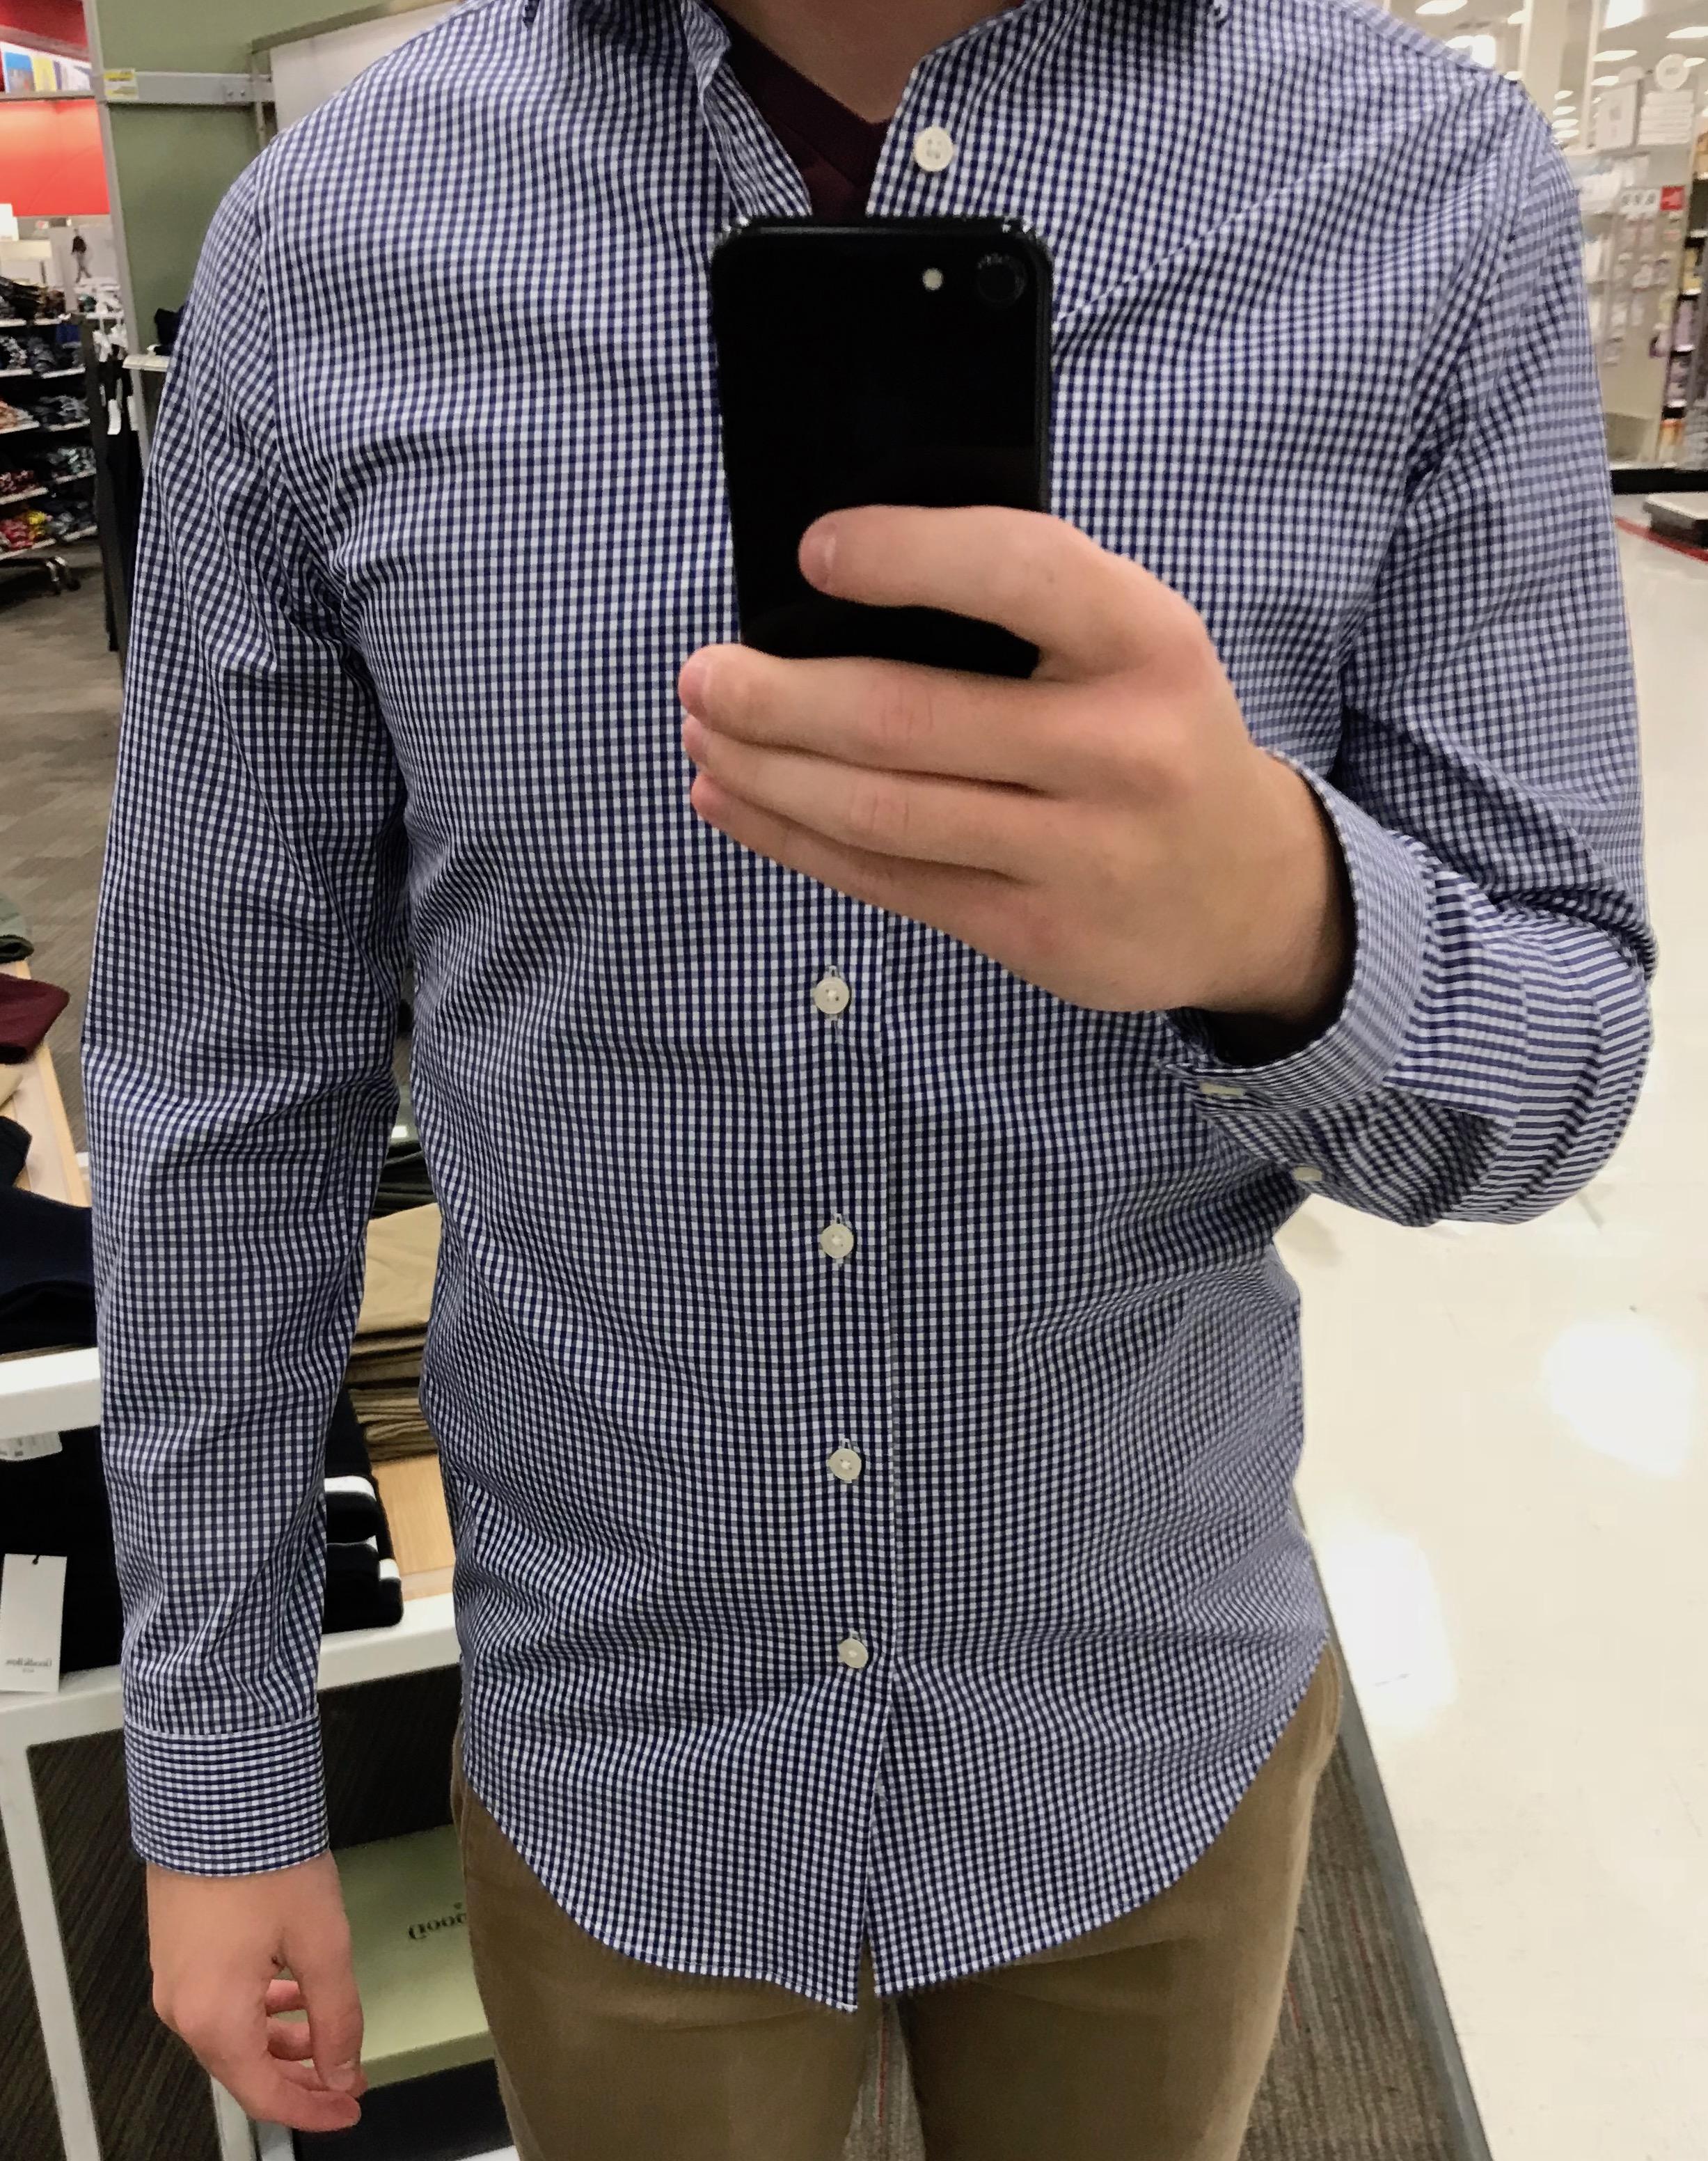 Slim Blue Gingham Dress Shirt - $29.99